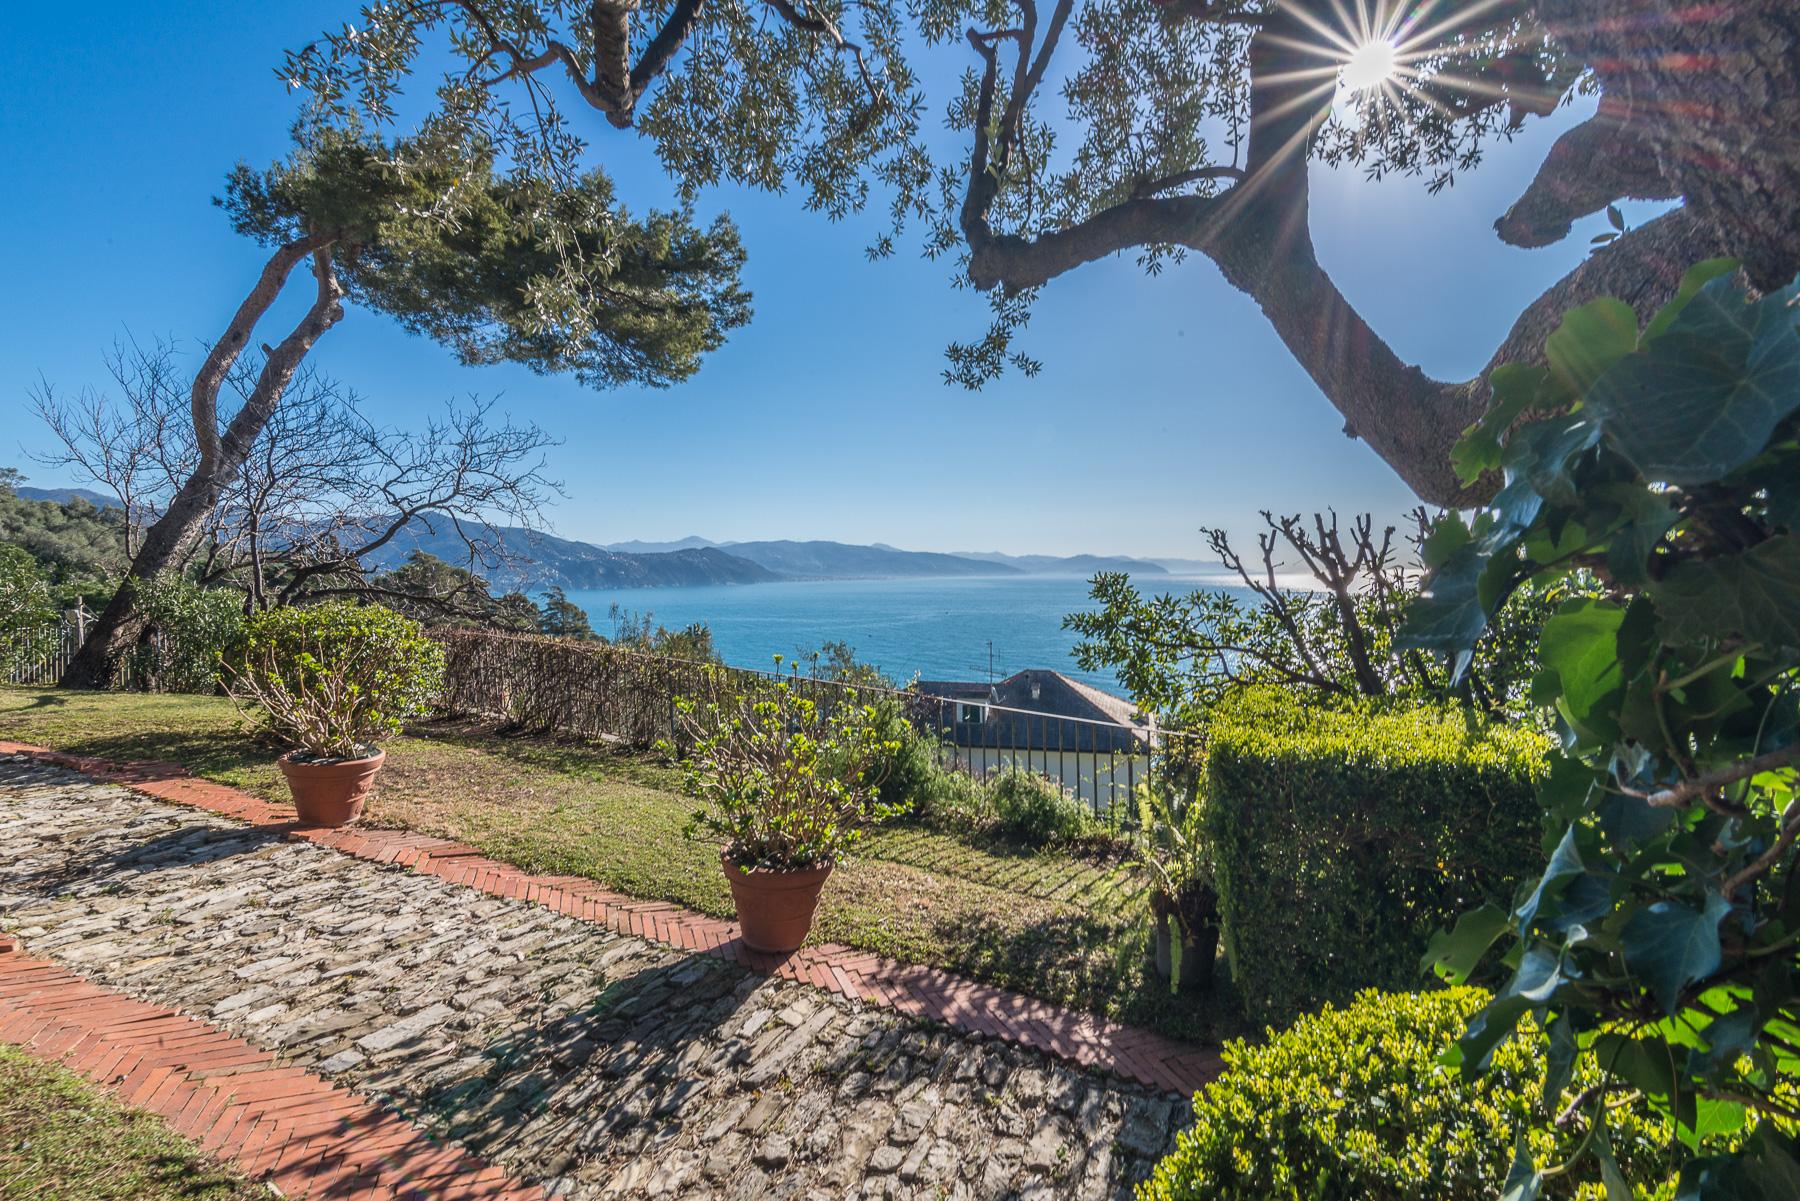 Villa in Vendita a Santa Margherita Ligure: 5 locali, 440 mq - Foto 4